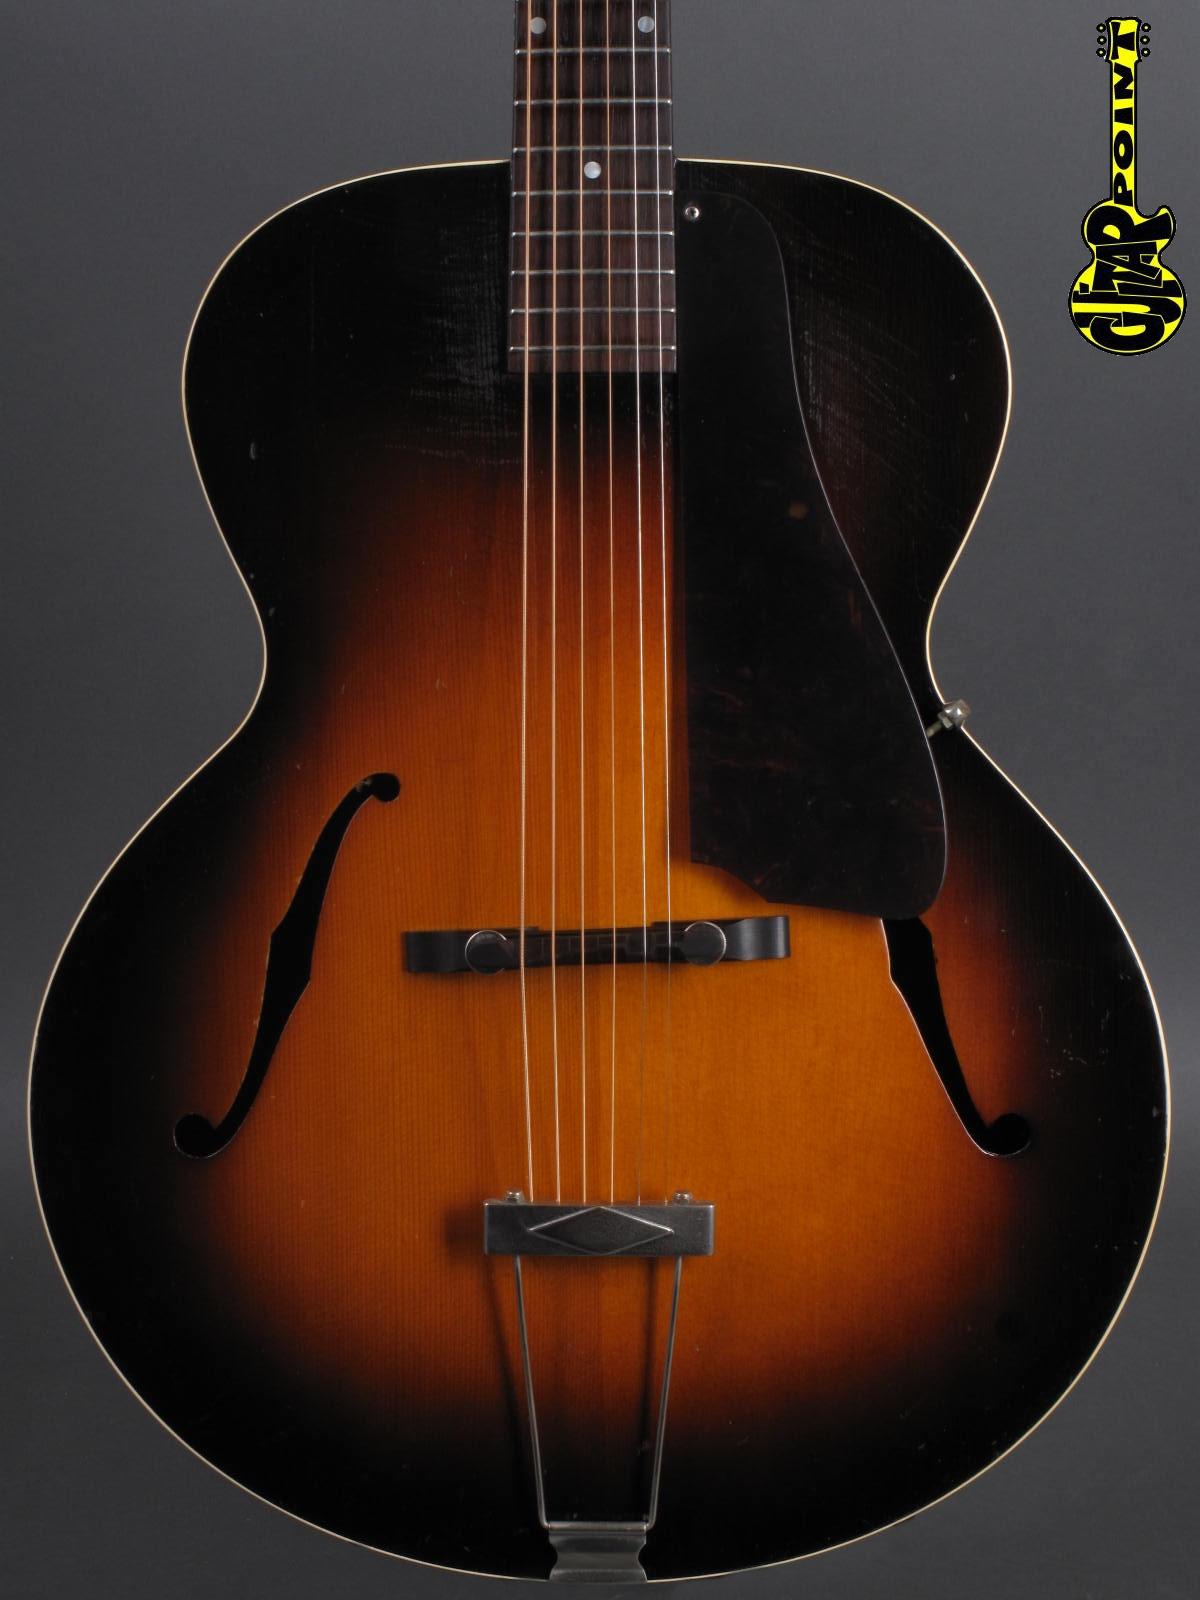 1938 Gibson L-50 - Sunburst  incl. orig. Geib case